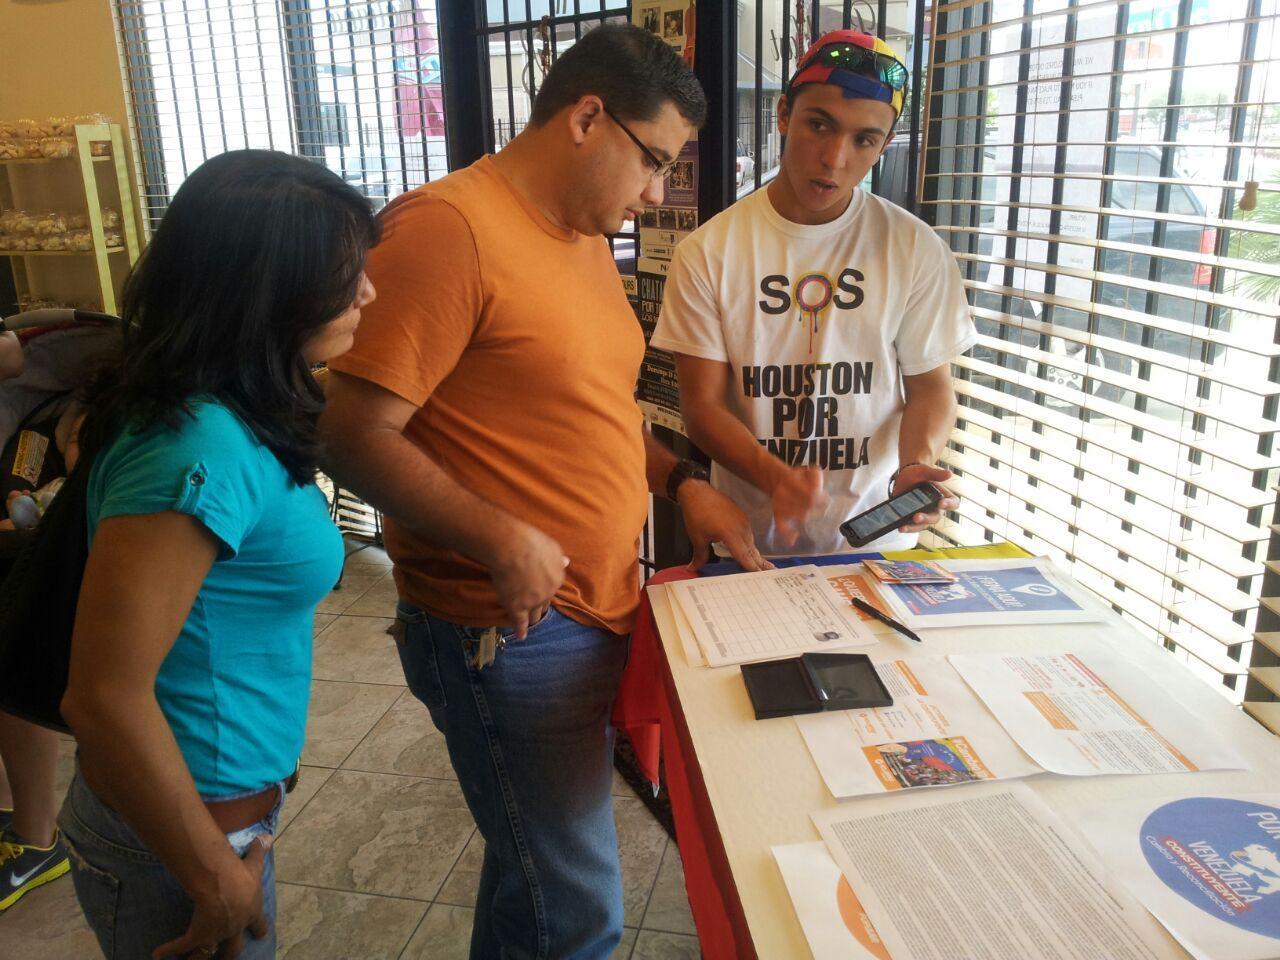 Junior champions for human rights in Venezuela